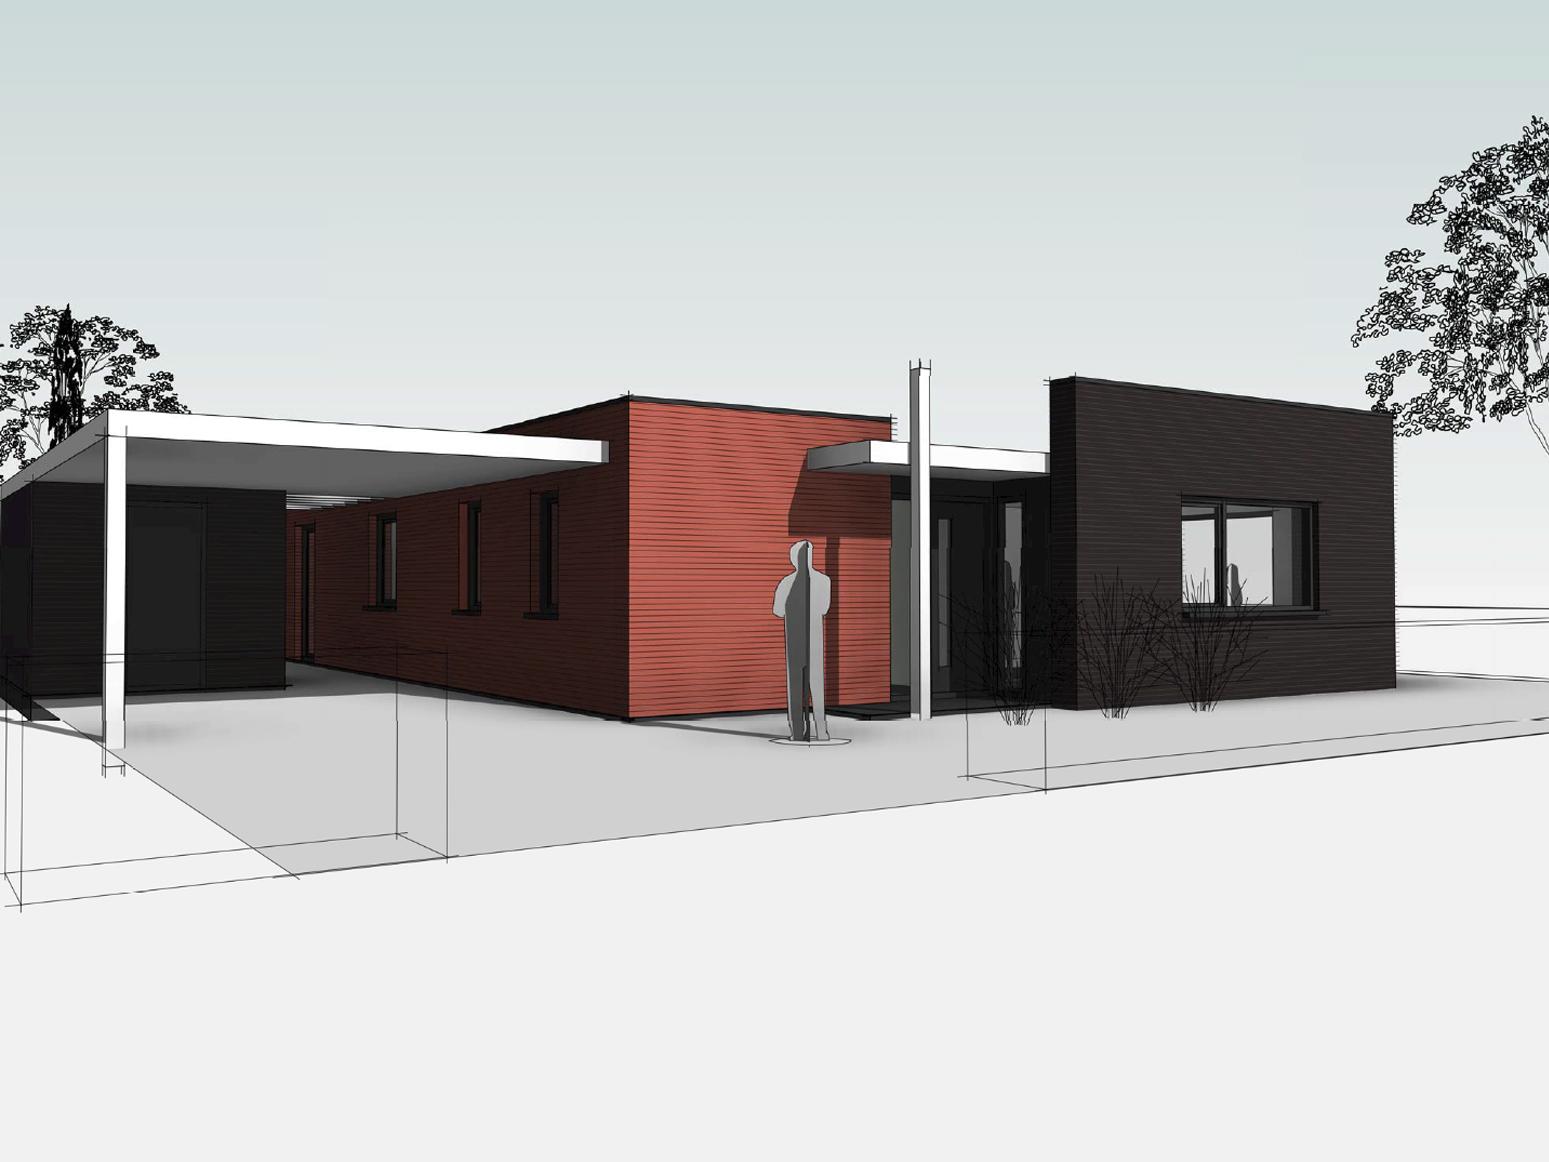 levensloopbestendigewoning-platdak-twello-van-oord-architectuur-en-design-wenum-wiesel-architect-voorst-architect-apeldoorn